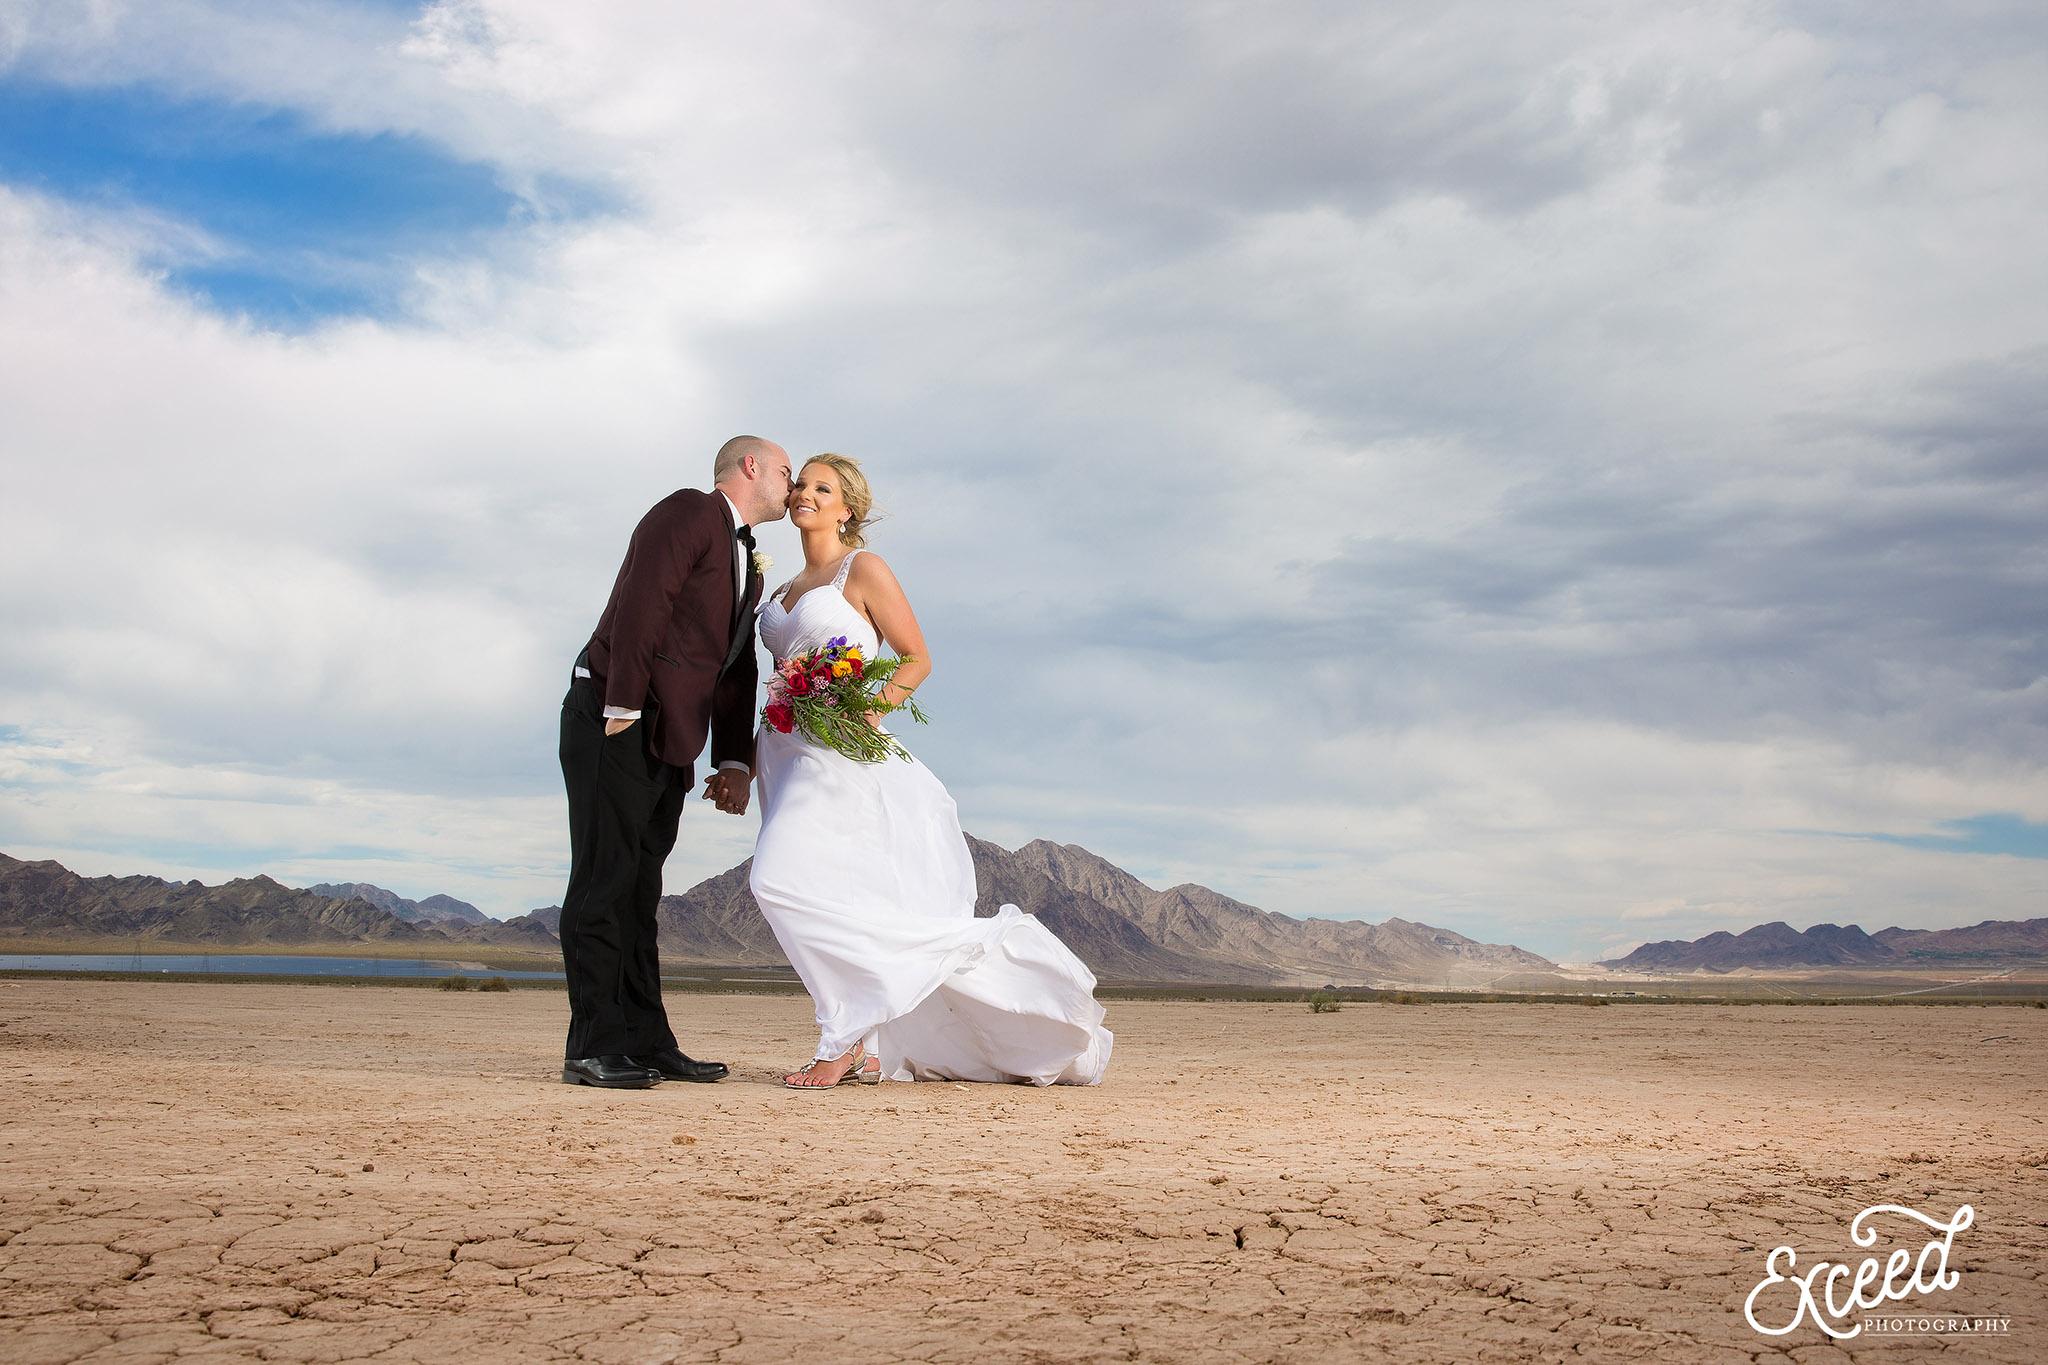 Las vegas desert elopement photos megan justin for Wedding photography las vegas